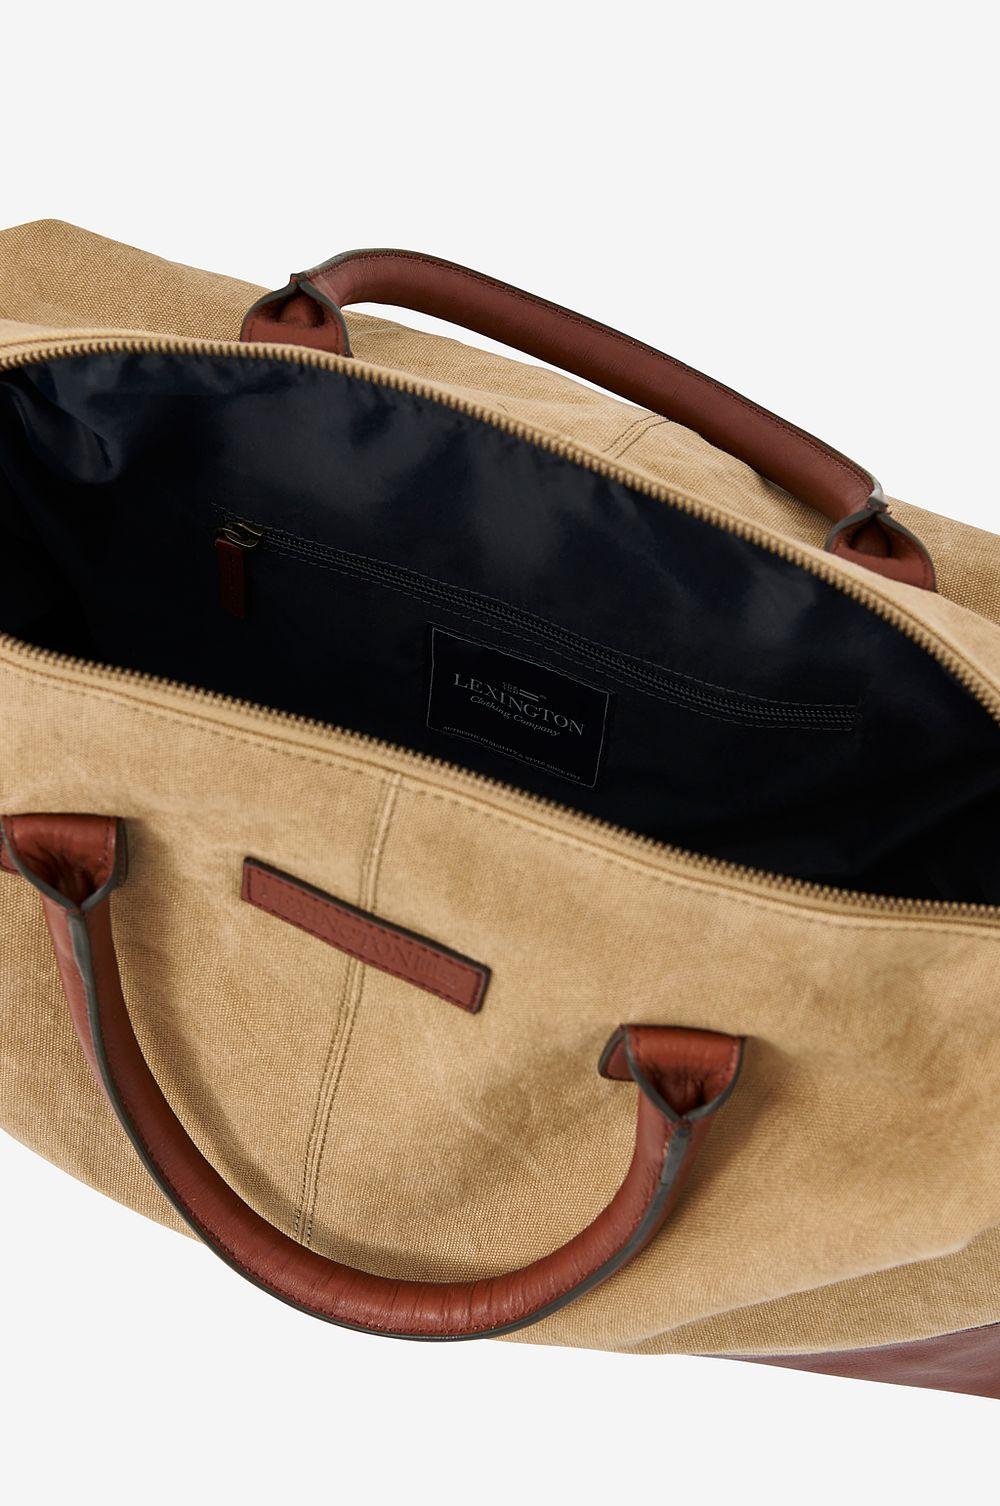 Lexington Sommerville Weekend Bag -laukku - Luonnonväri - Miehet ... dc800eecac